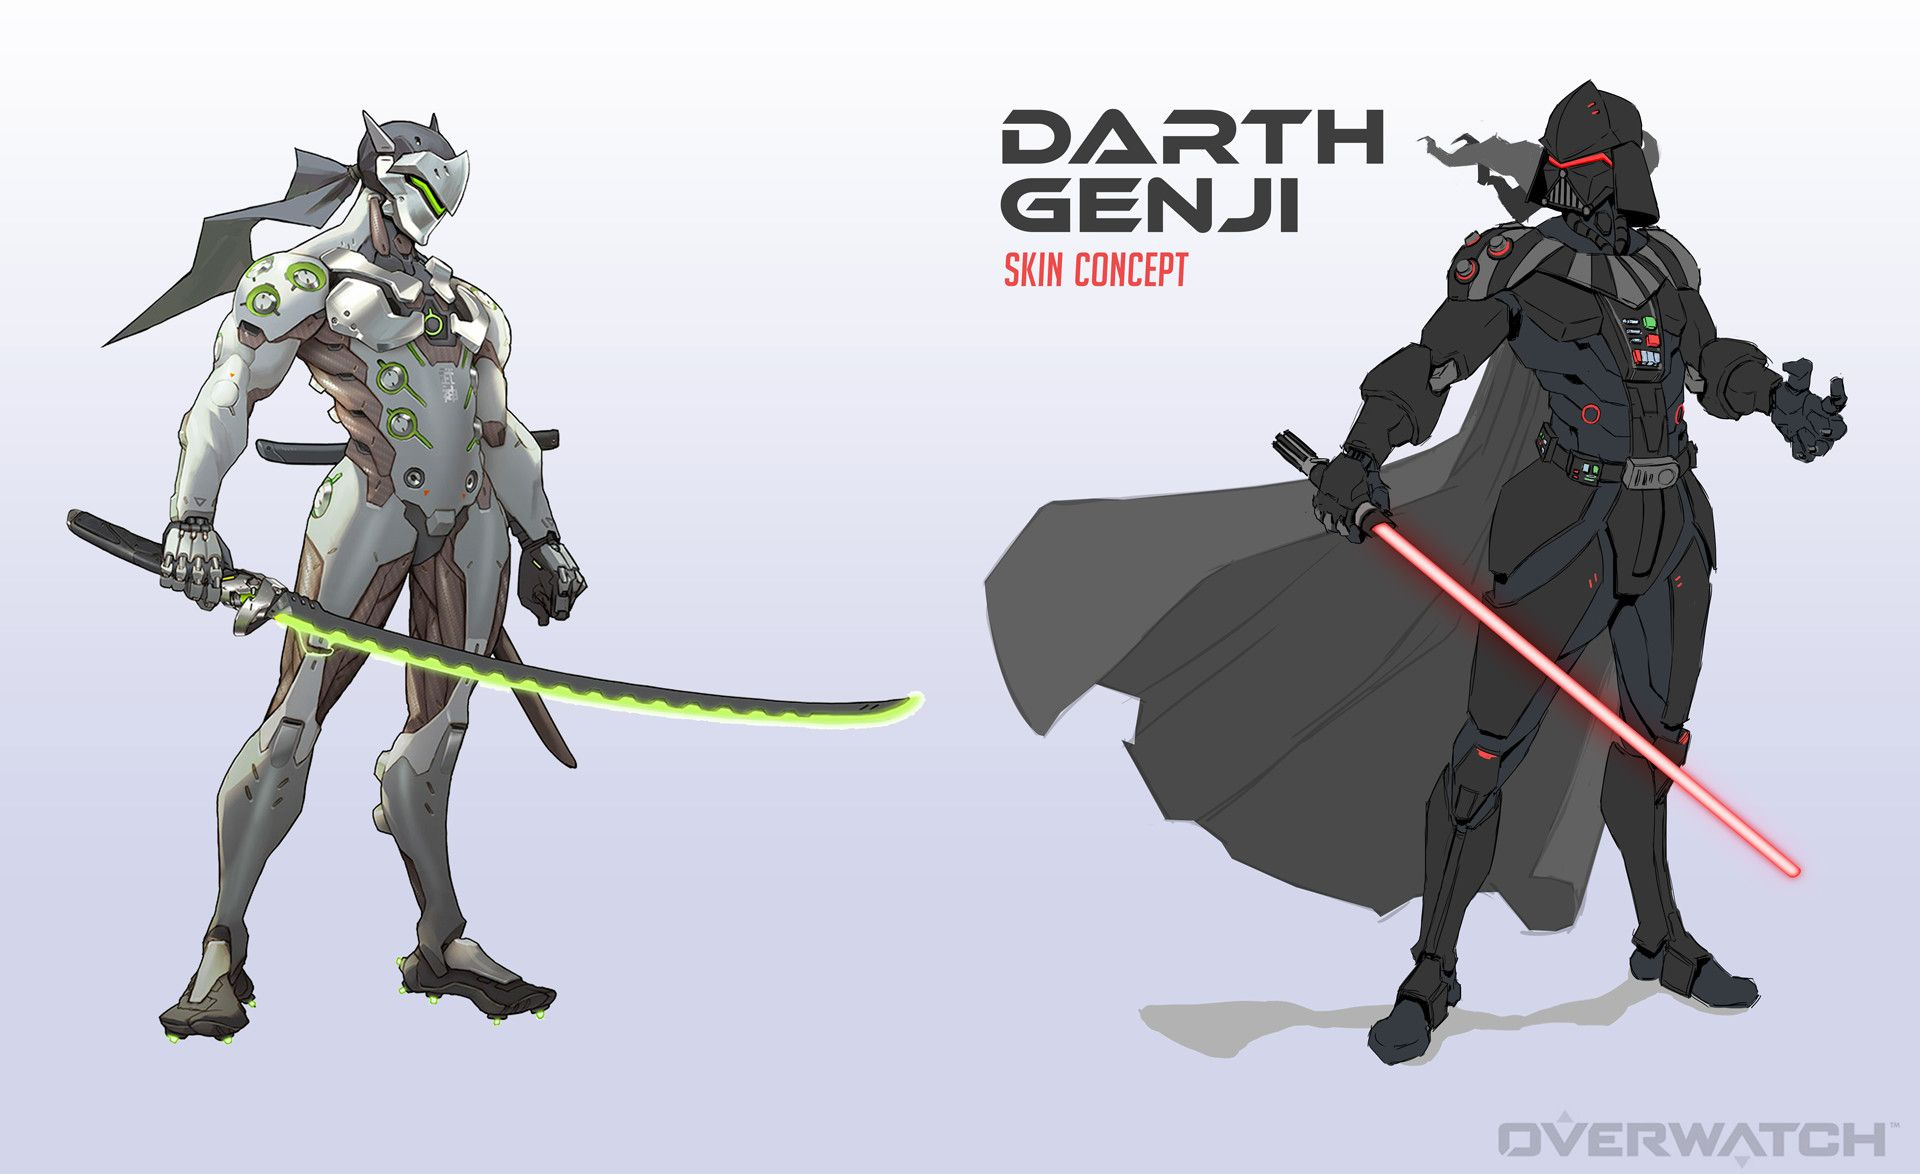 Overwatch Feed On Twitter Quot Star Wars Genji Skin Concept